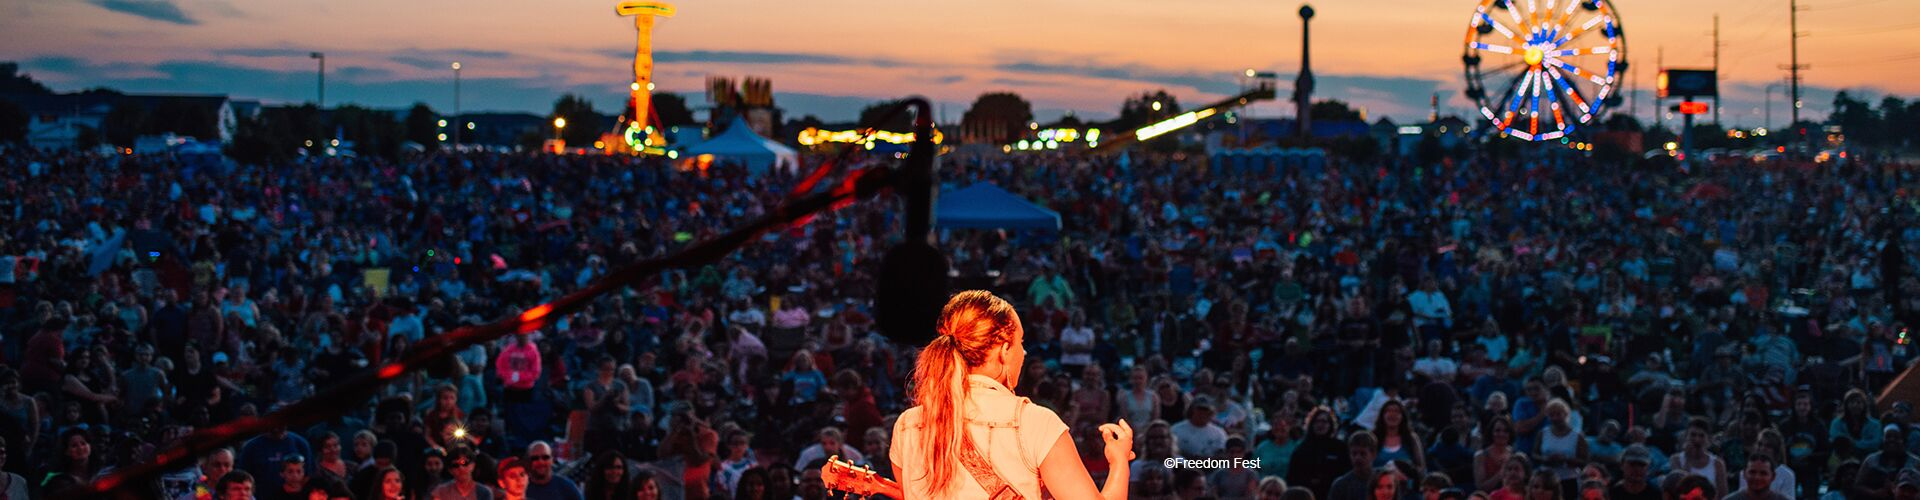 Freedom Fest Janesville